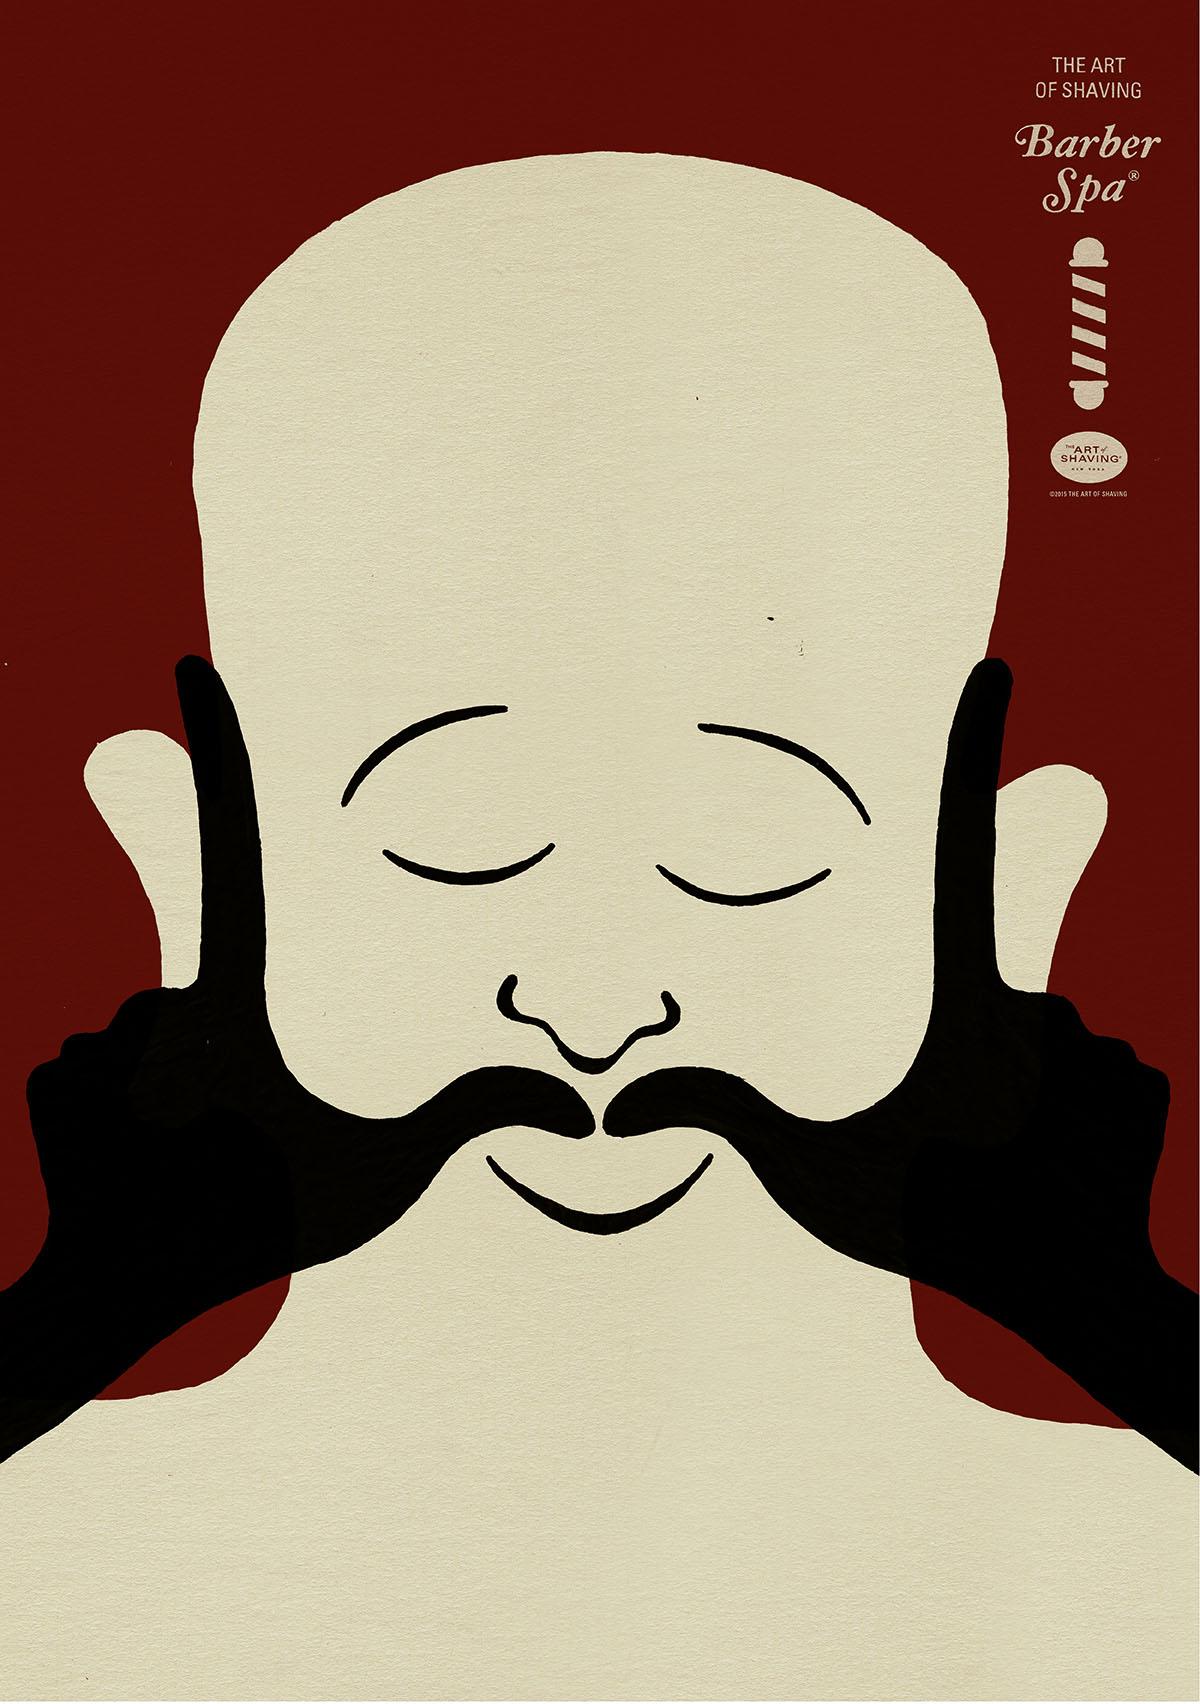 barber_spa_5_RGB_o.jpg